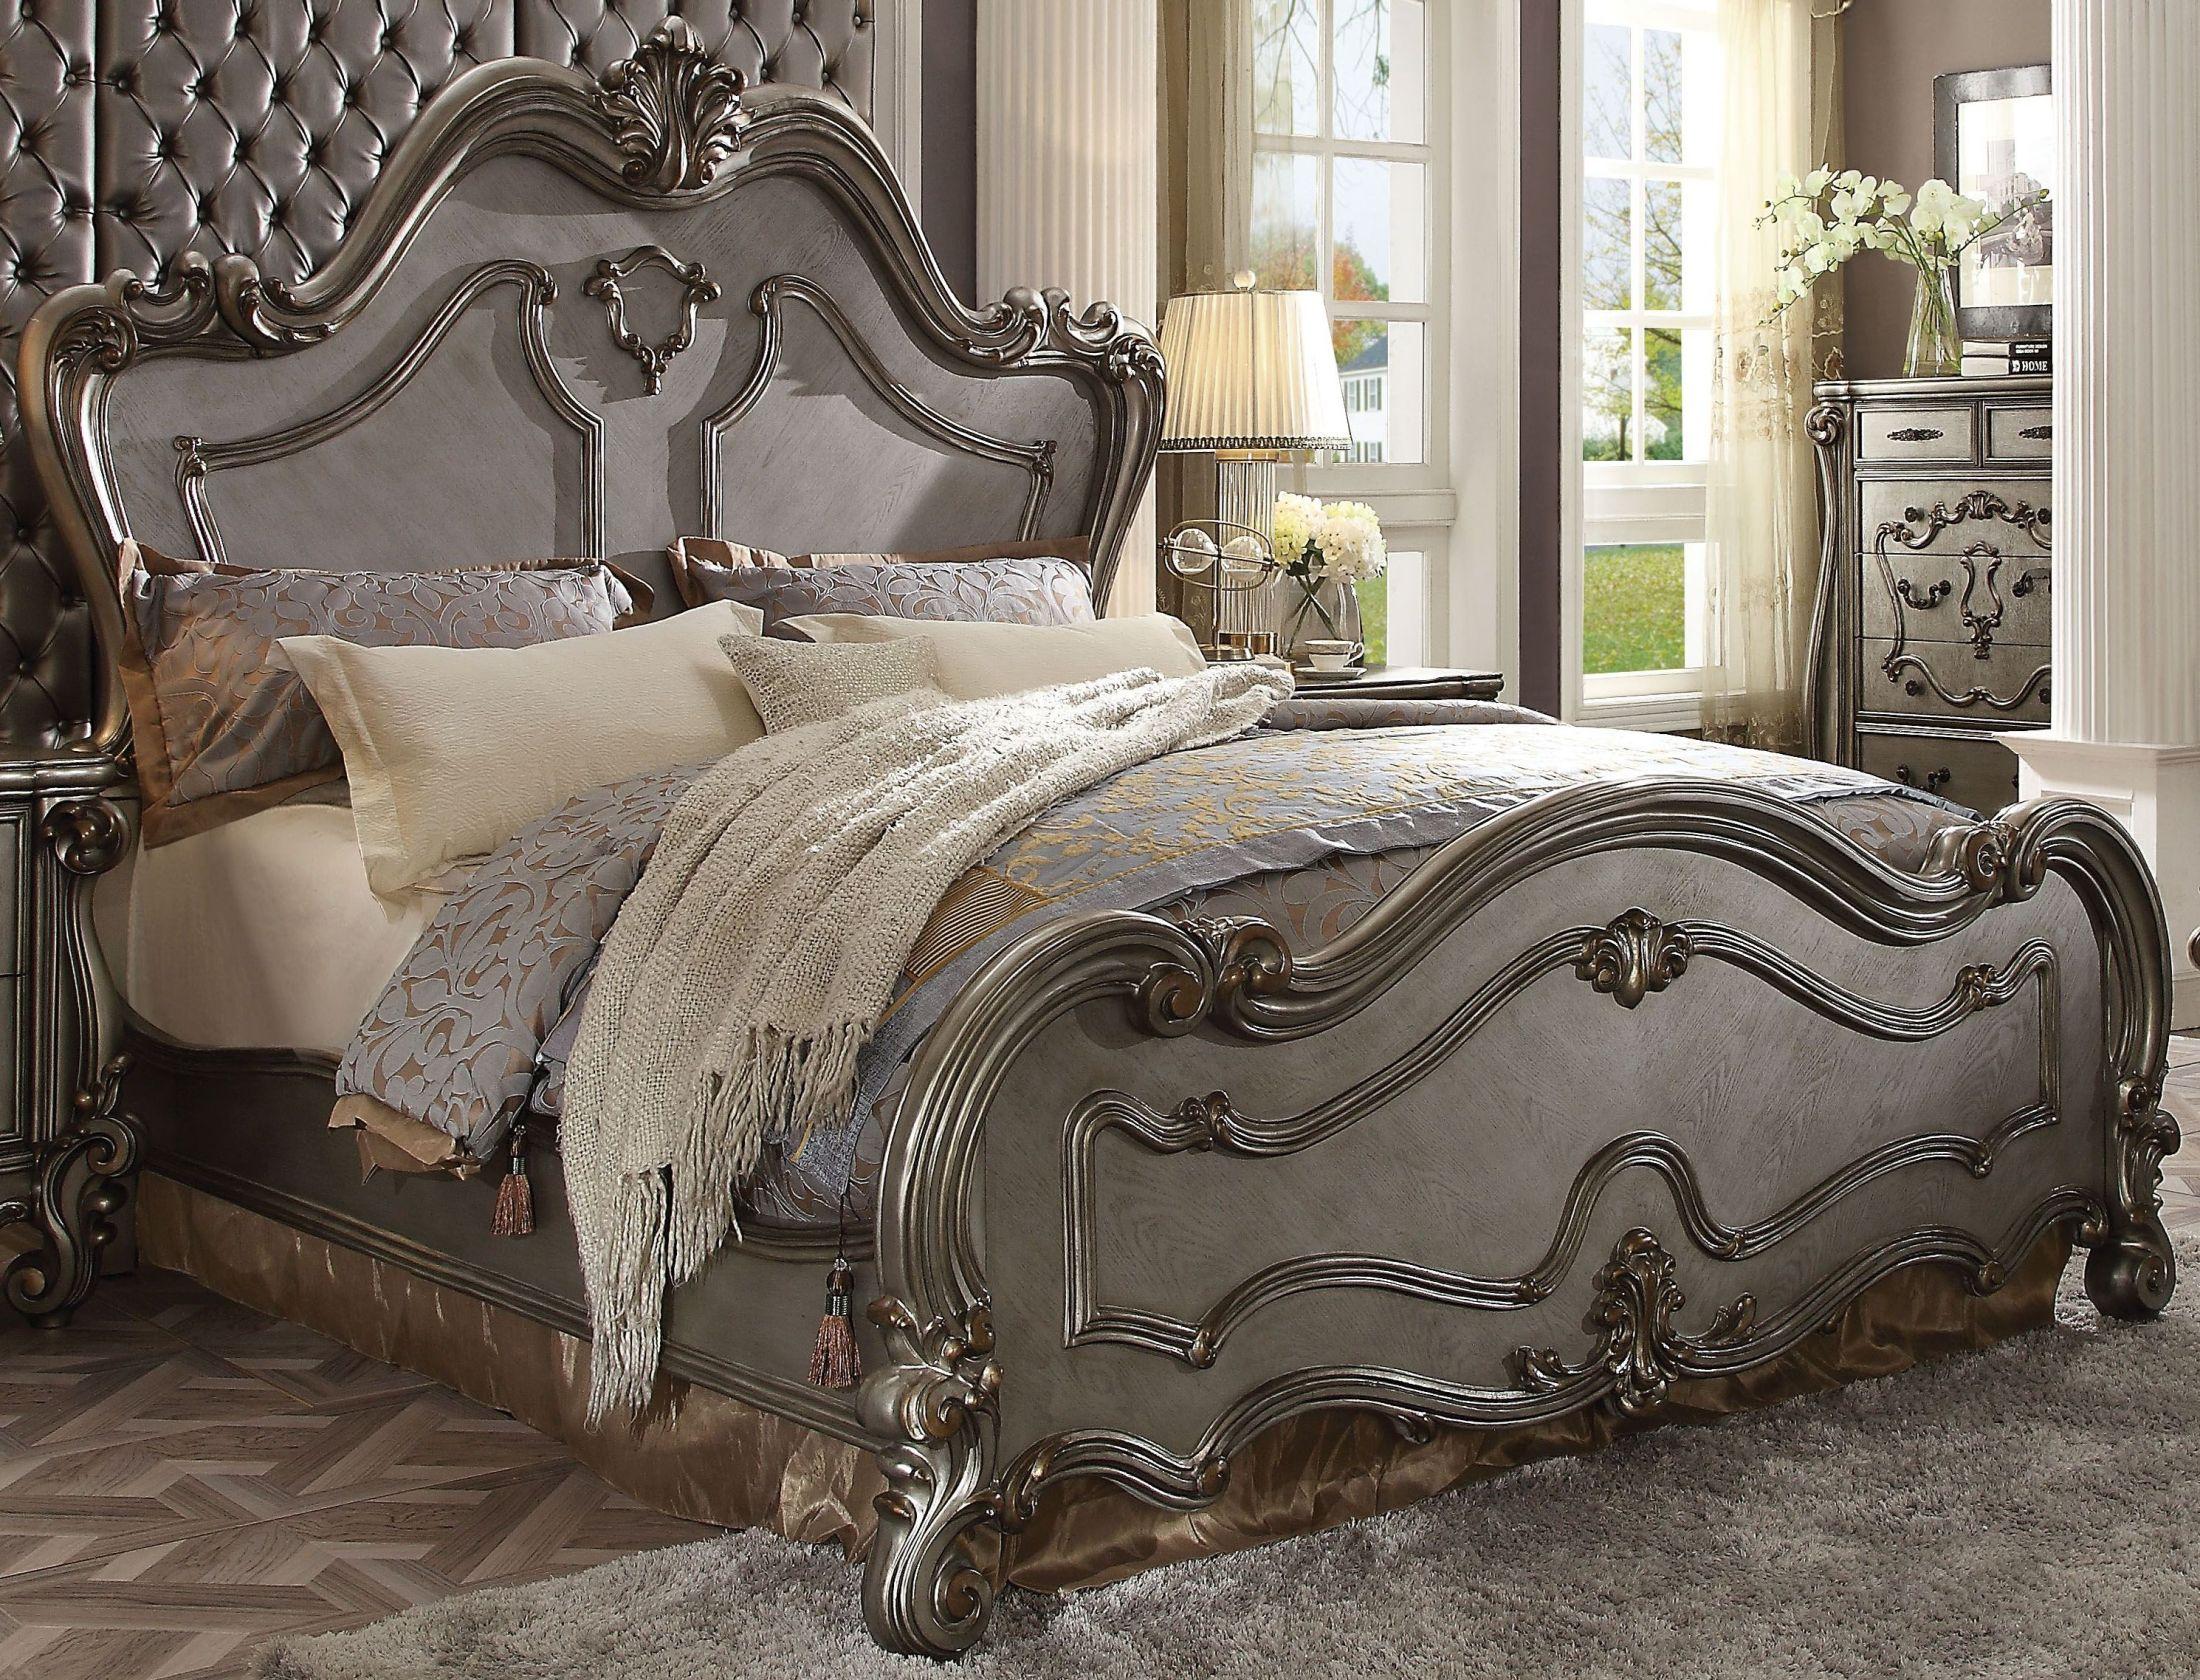 Acme versailles antique platinum queen panel bed - New classic versailles bedroom set ...